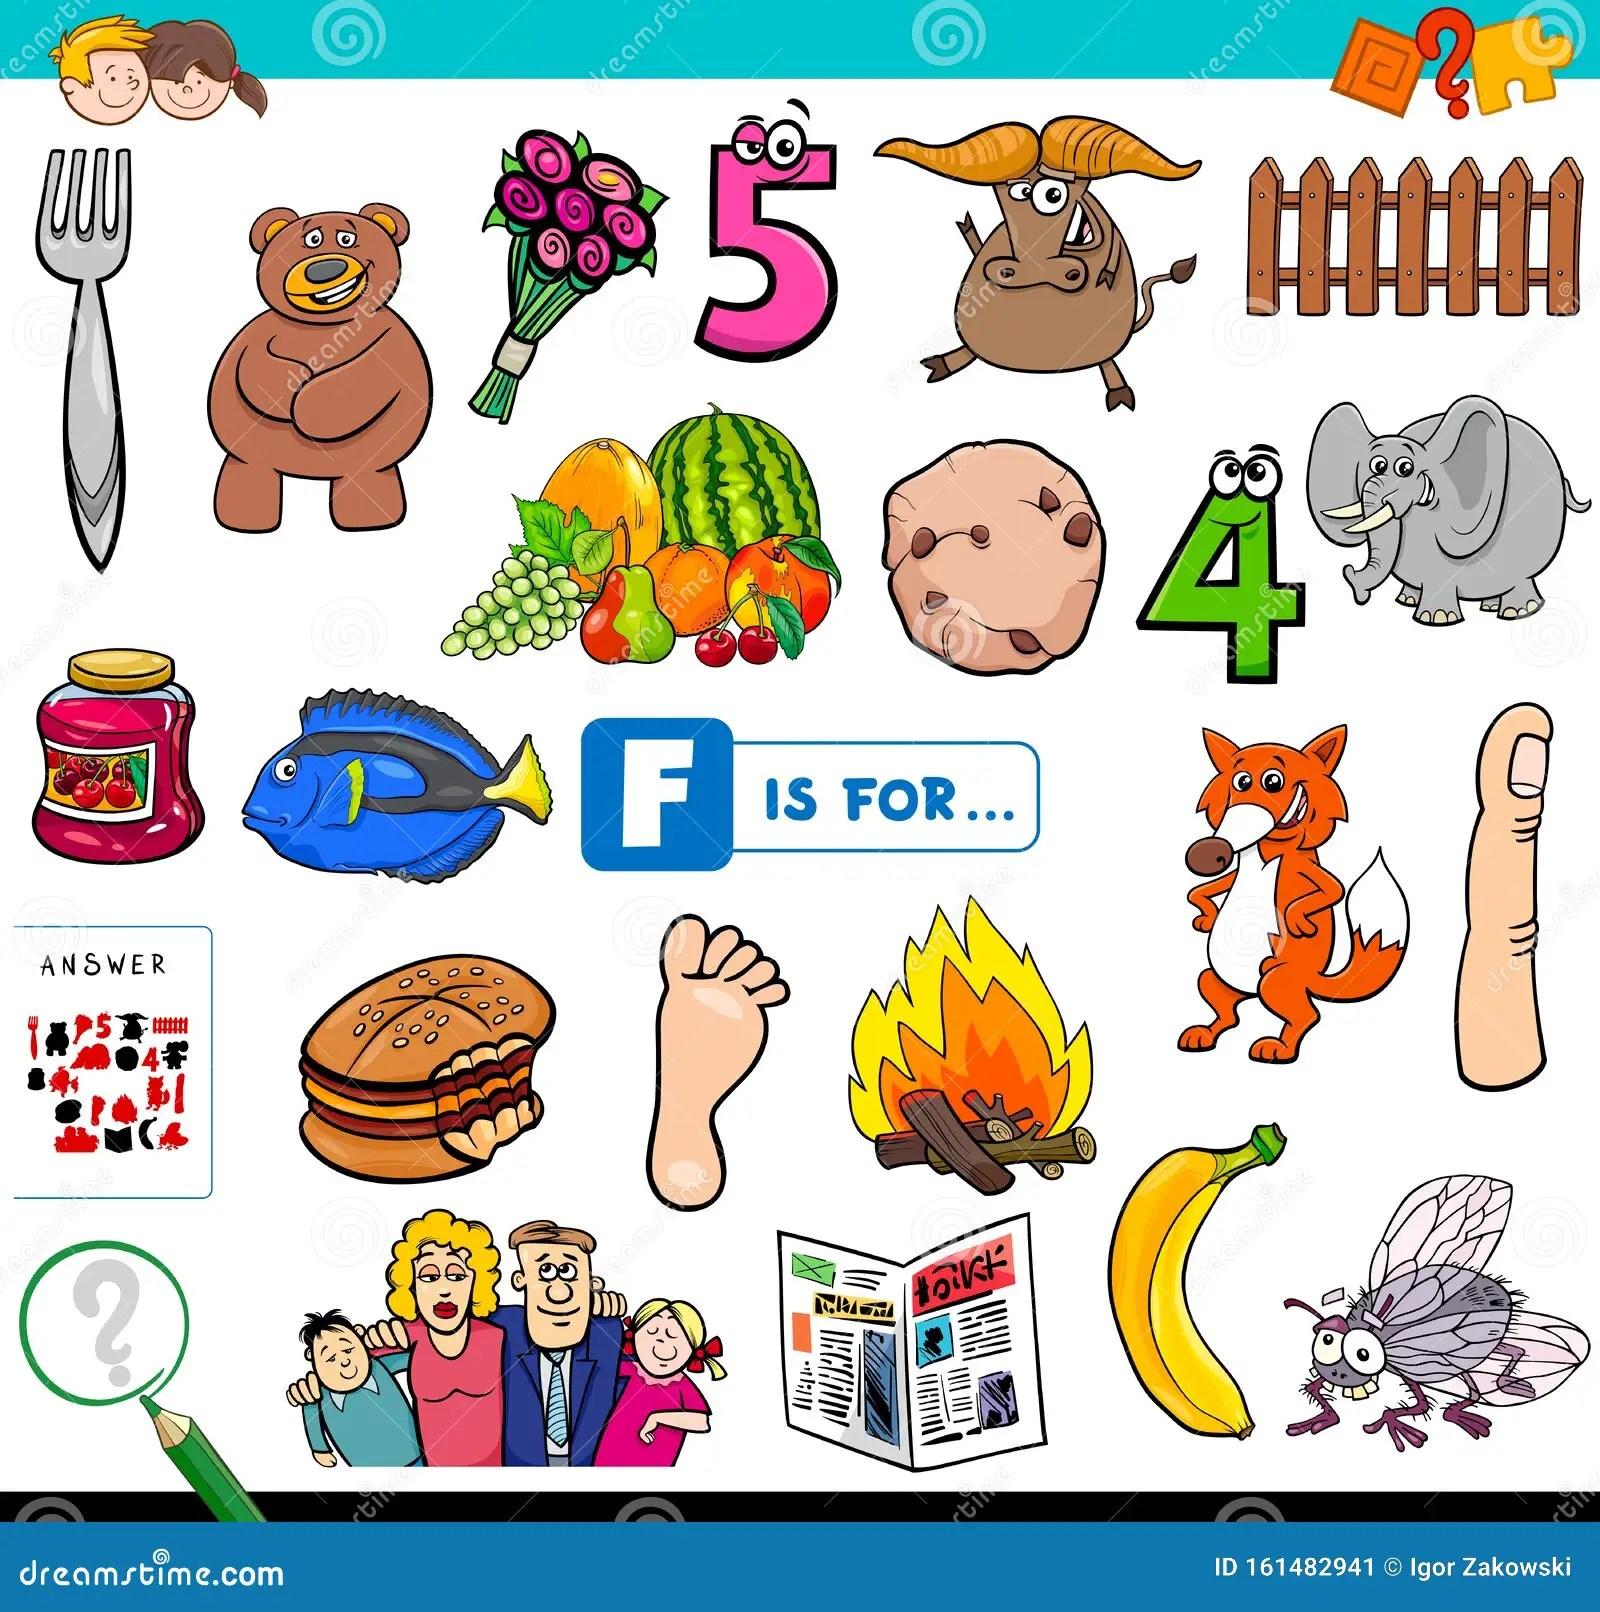 F Is For Words Educational Task For Children Stock Vector